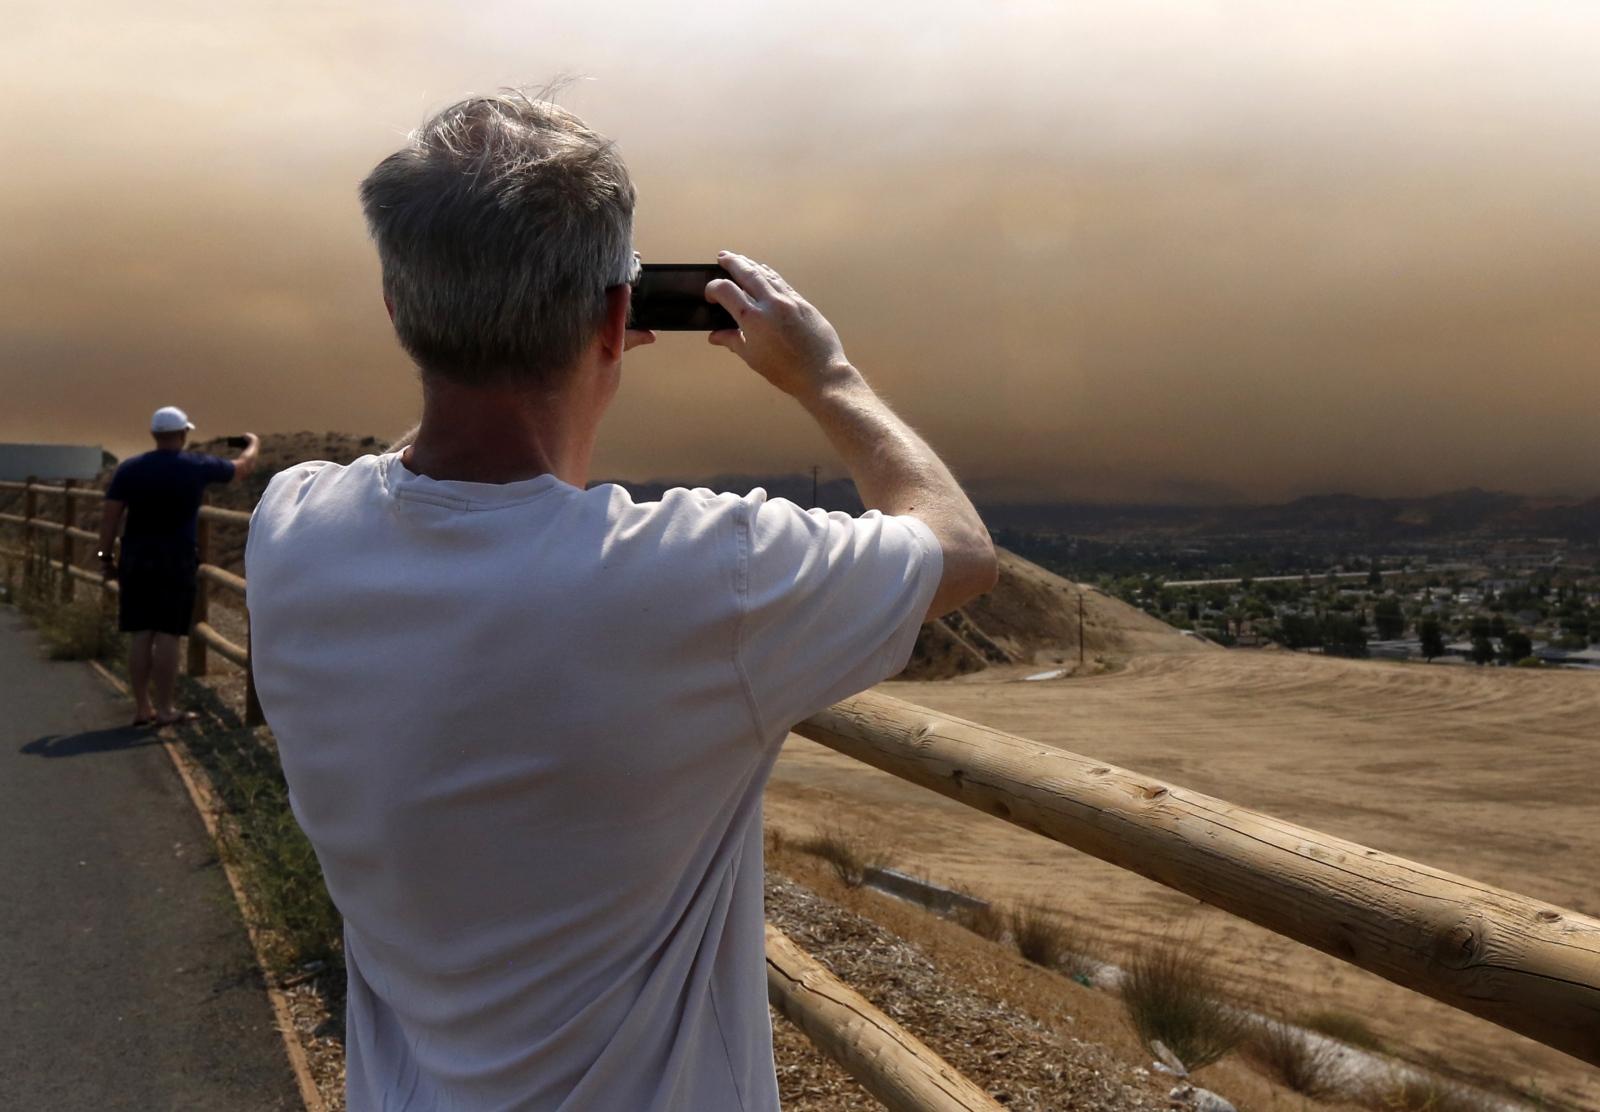 Santa Clarita residents take photos of the smoke as the Sand Fire burns on Saturday, July 23, 2016. Katharine Lotze/The Signal